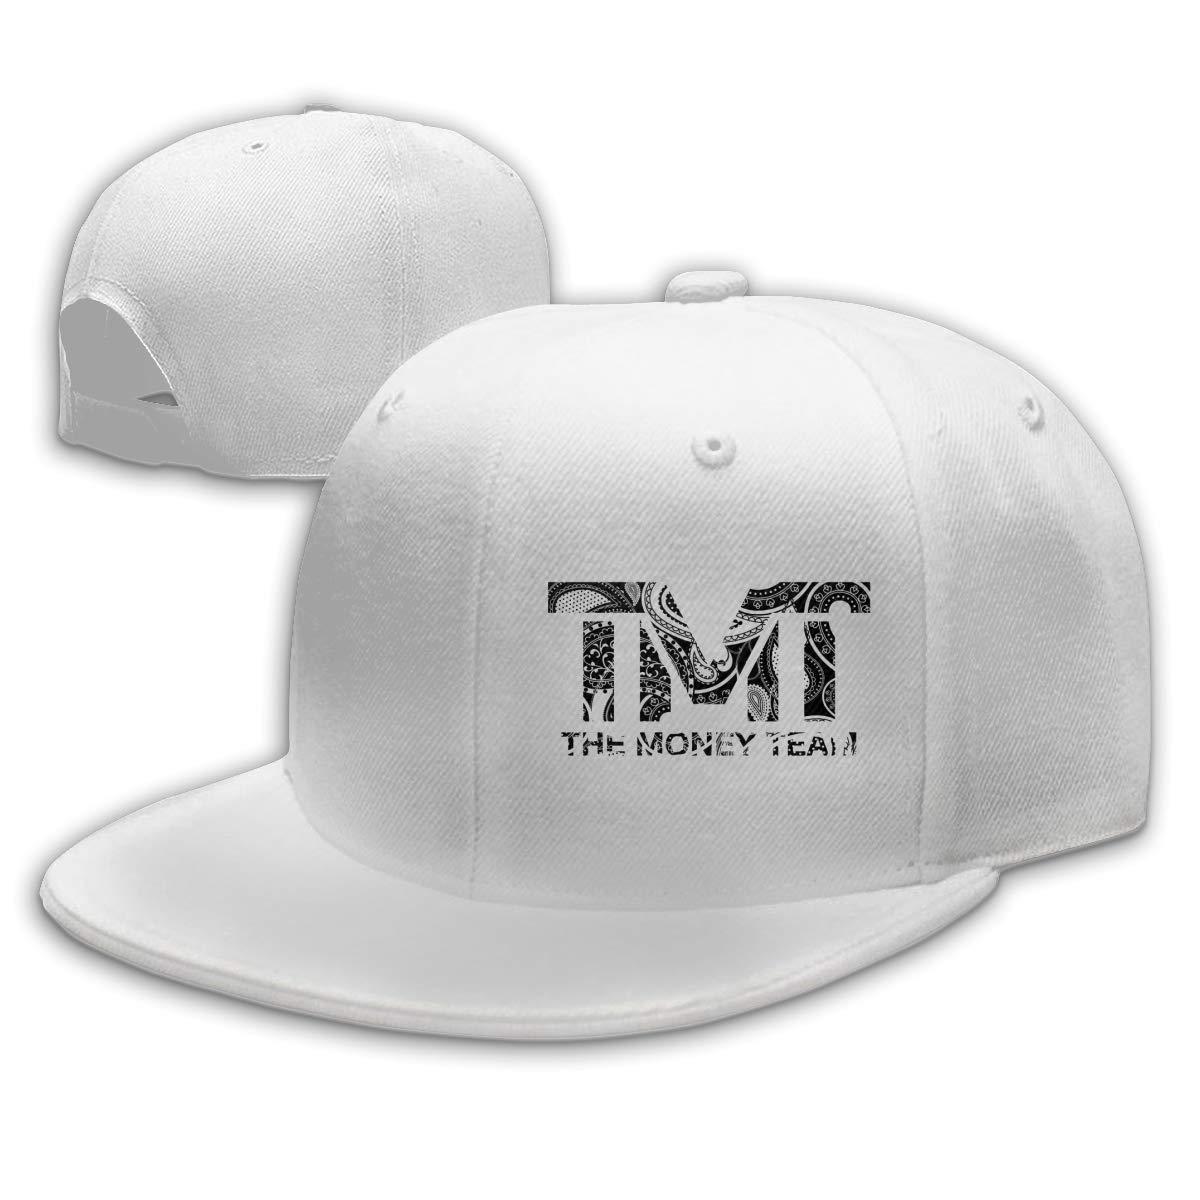 caee3c93 RDYLLLY Floyd Mayweather TMT Baseball Caps Adjustable Rapper Hip-Hop Hats  Men Women Black at Amazon Men's Clothing store: